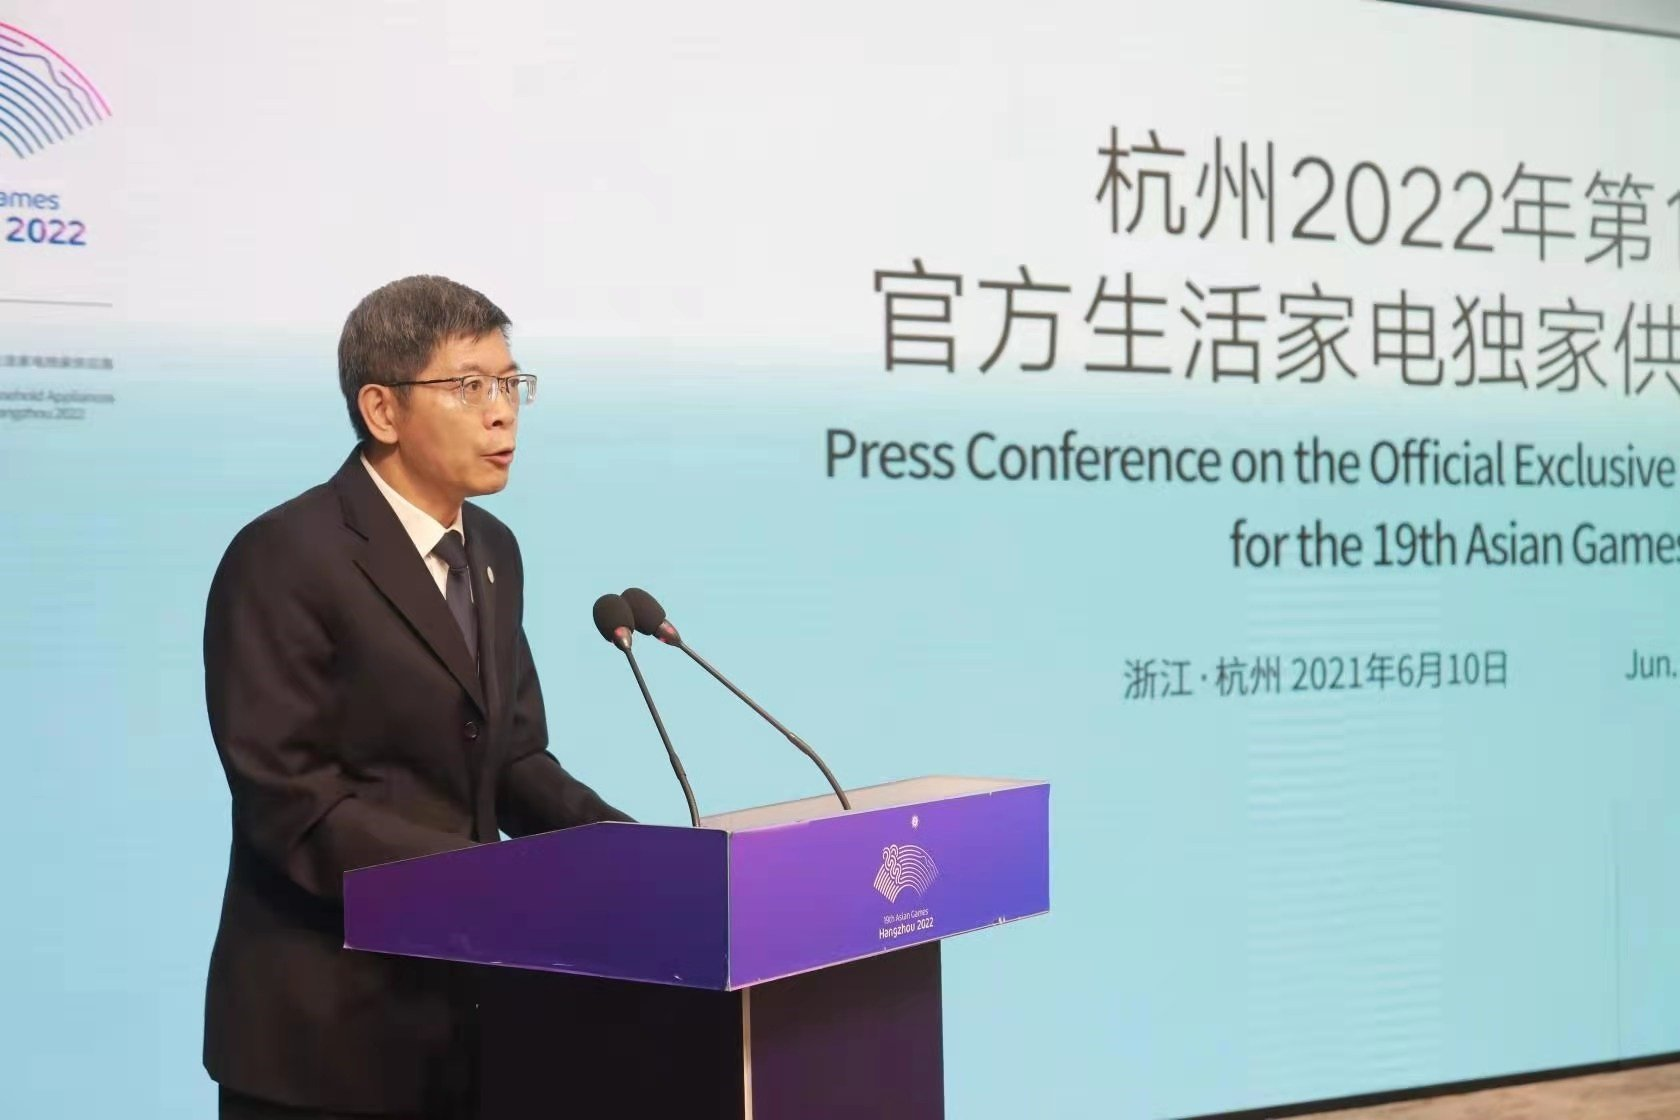 Photo: Mao Genhong, Deputy Secretary-General of the 19th Asian Games Hangzhou 2022 Organising Committee (HAGOC) and Deputy Secretary-General of Hangzhou Municipal Government